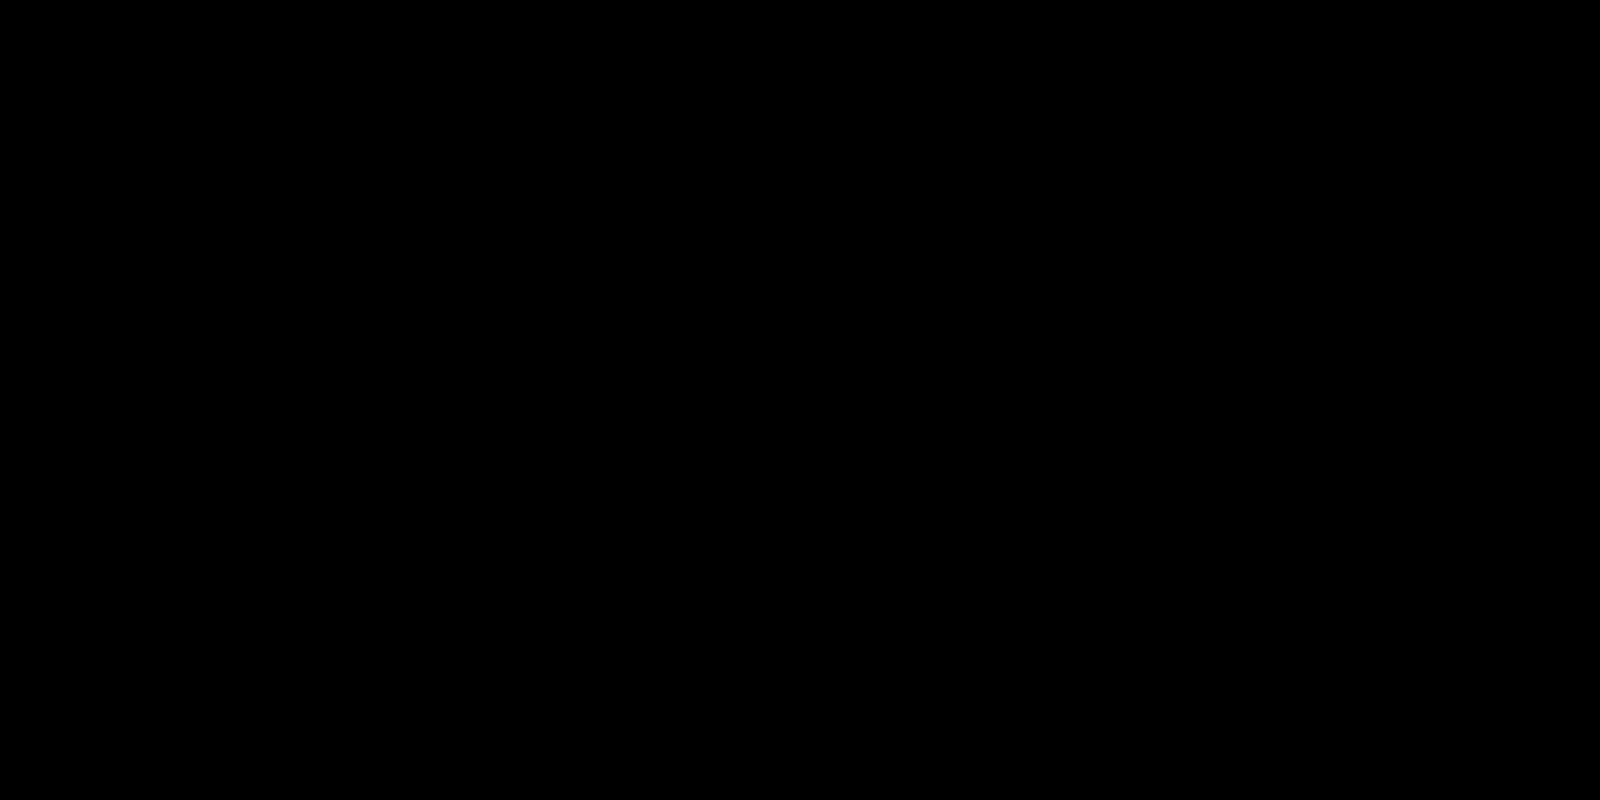 File:Furious-7-logo.png